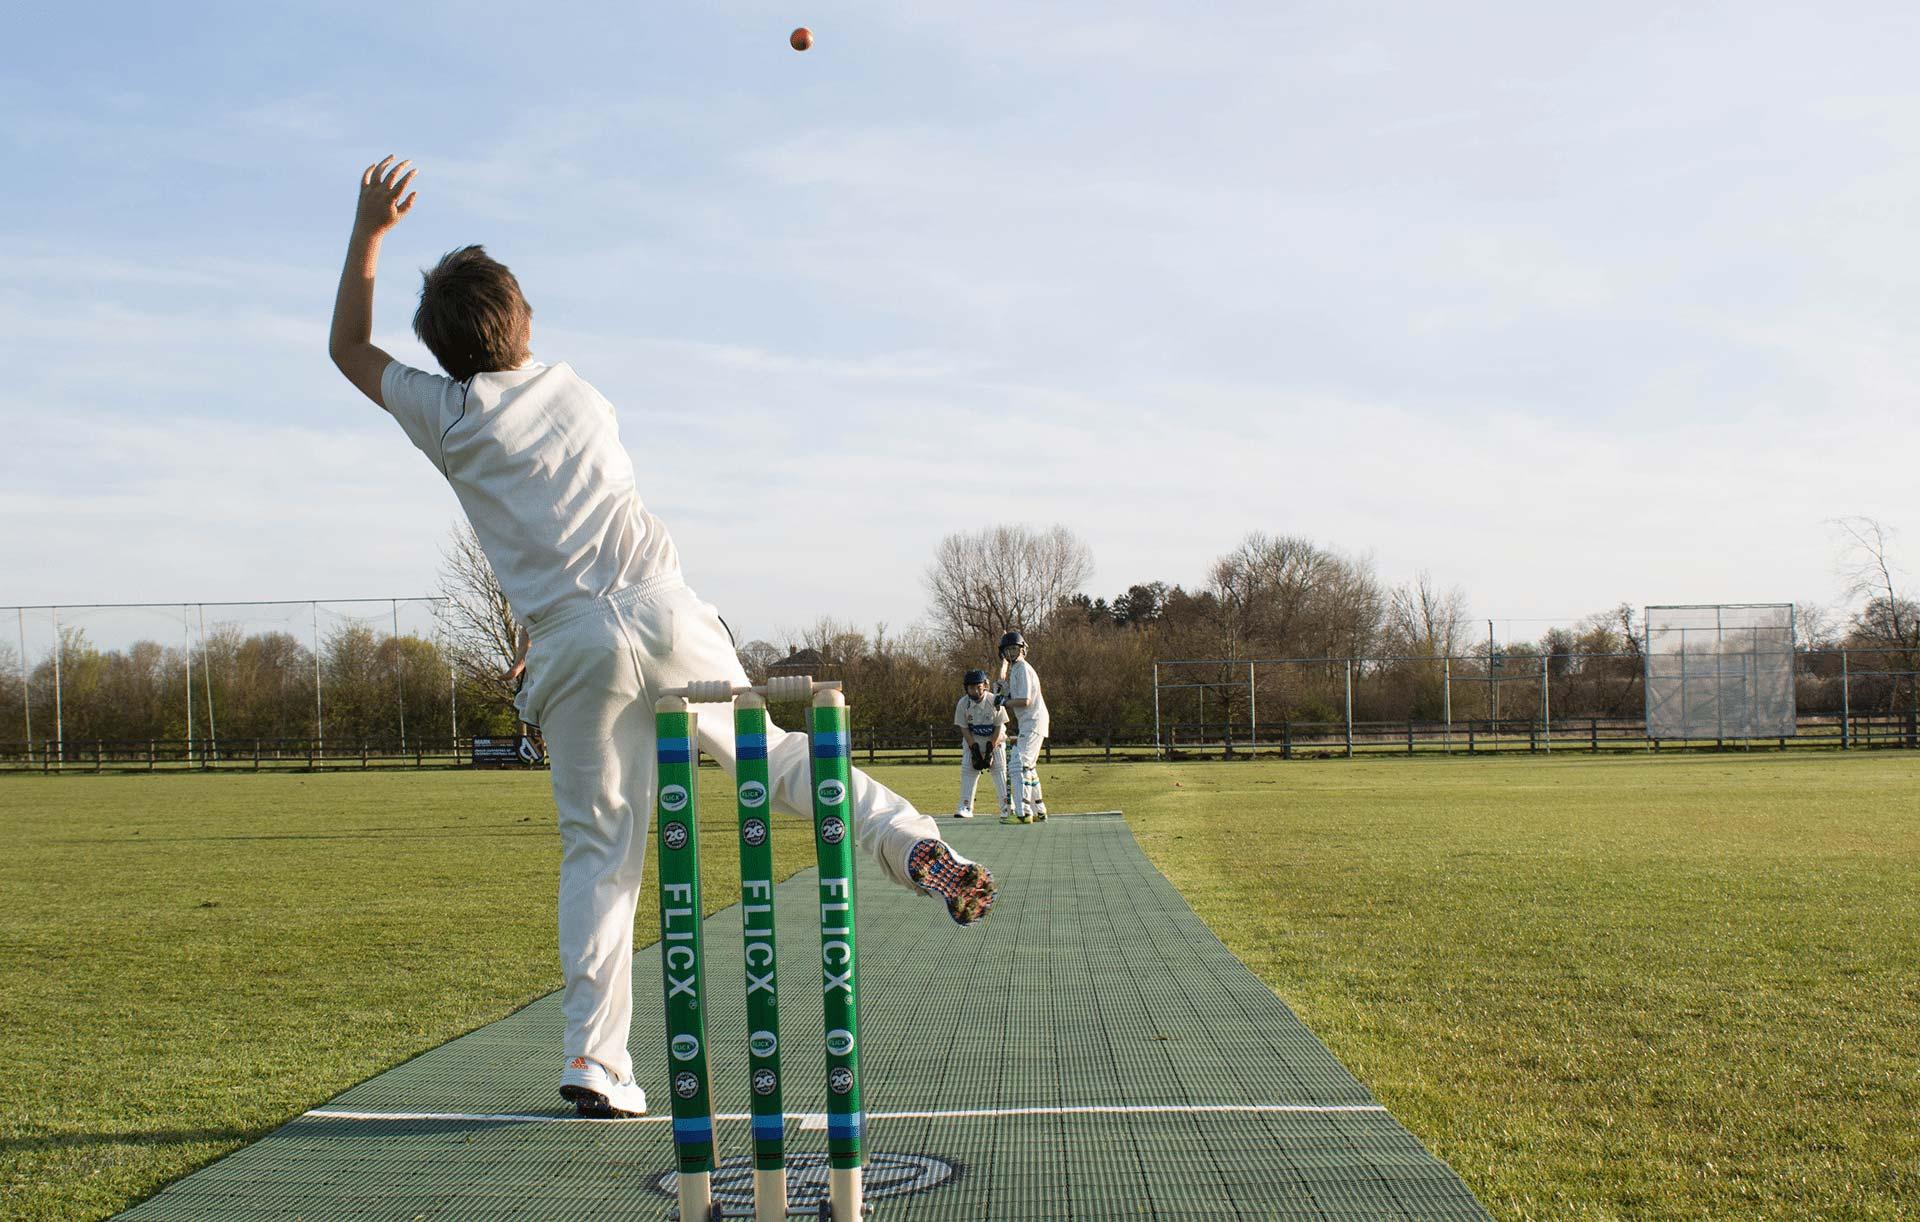 2G Flicx Pitch - Portable Cricket Match Pitch